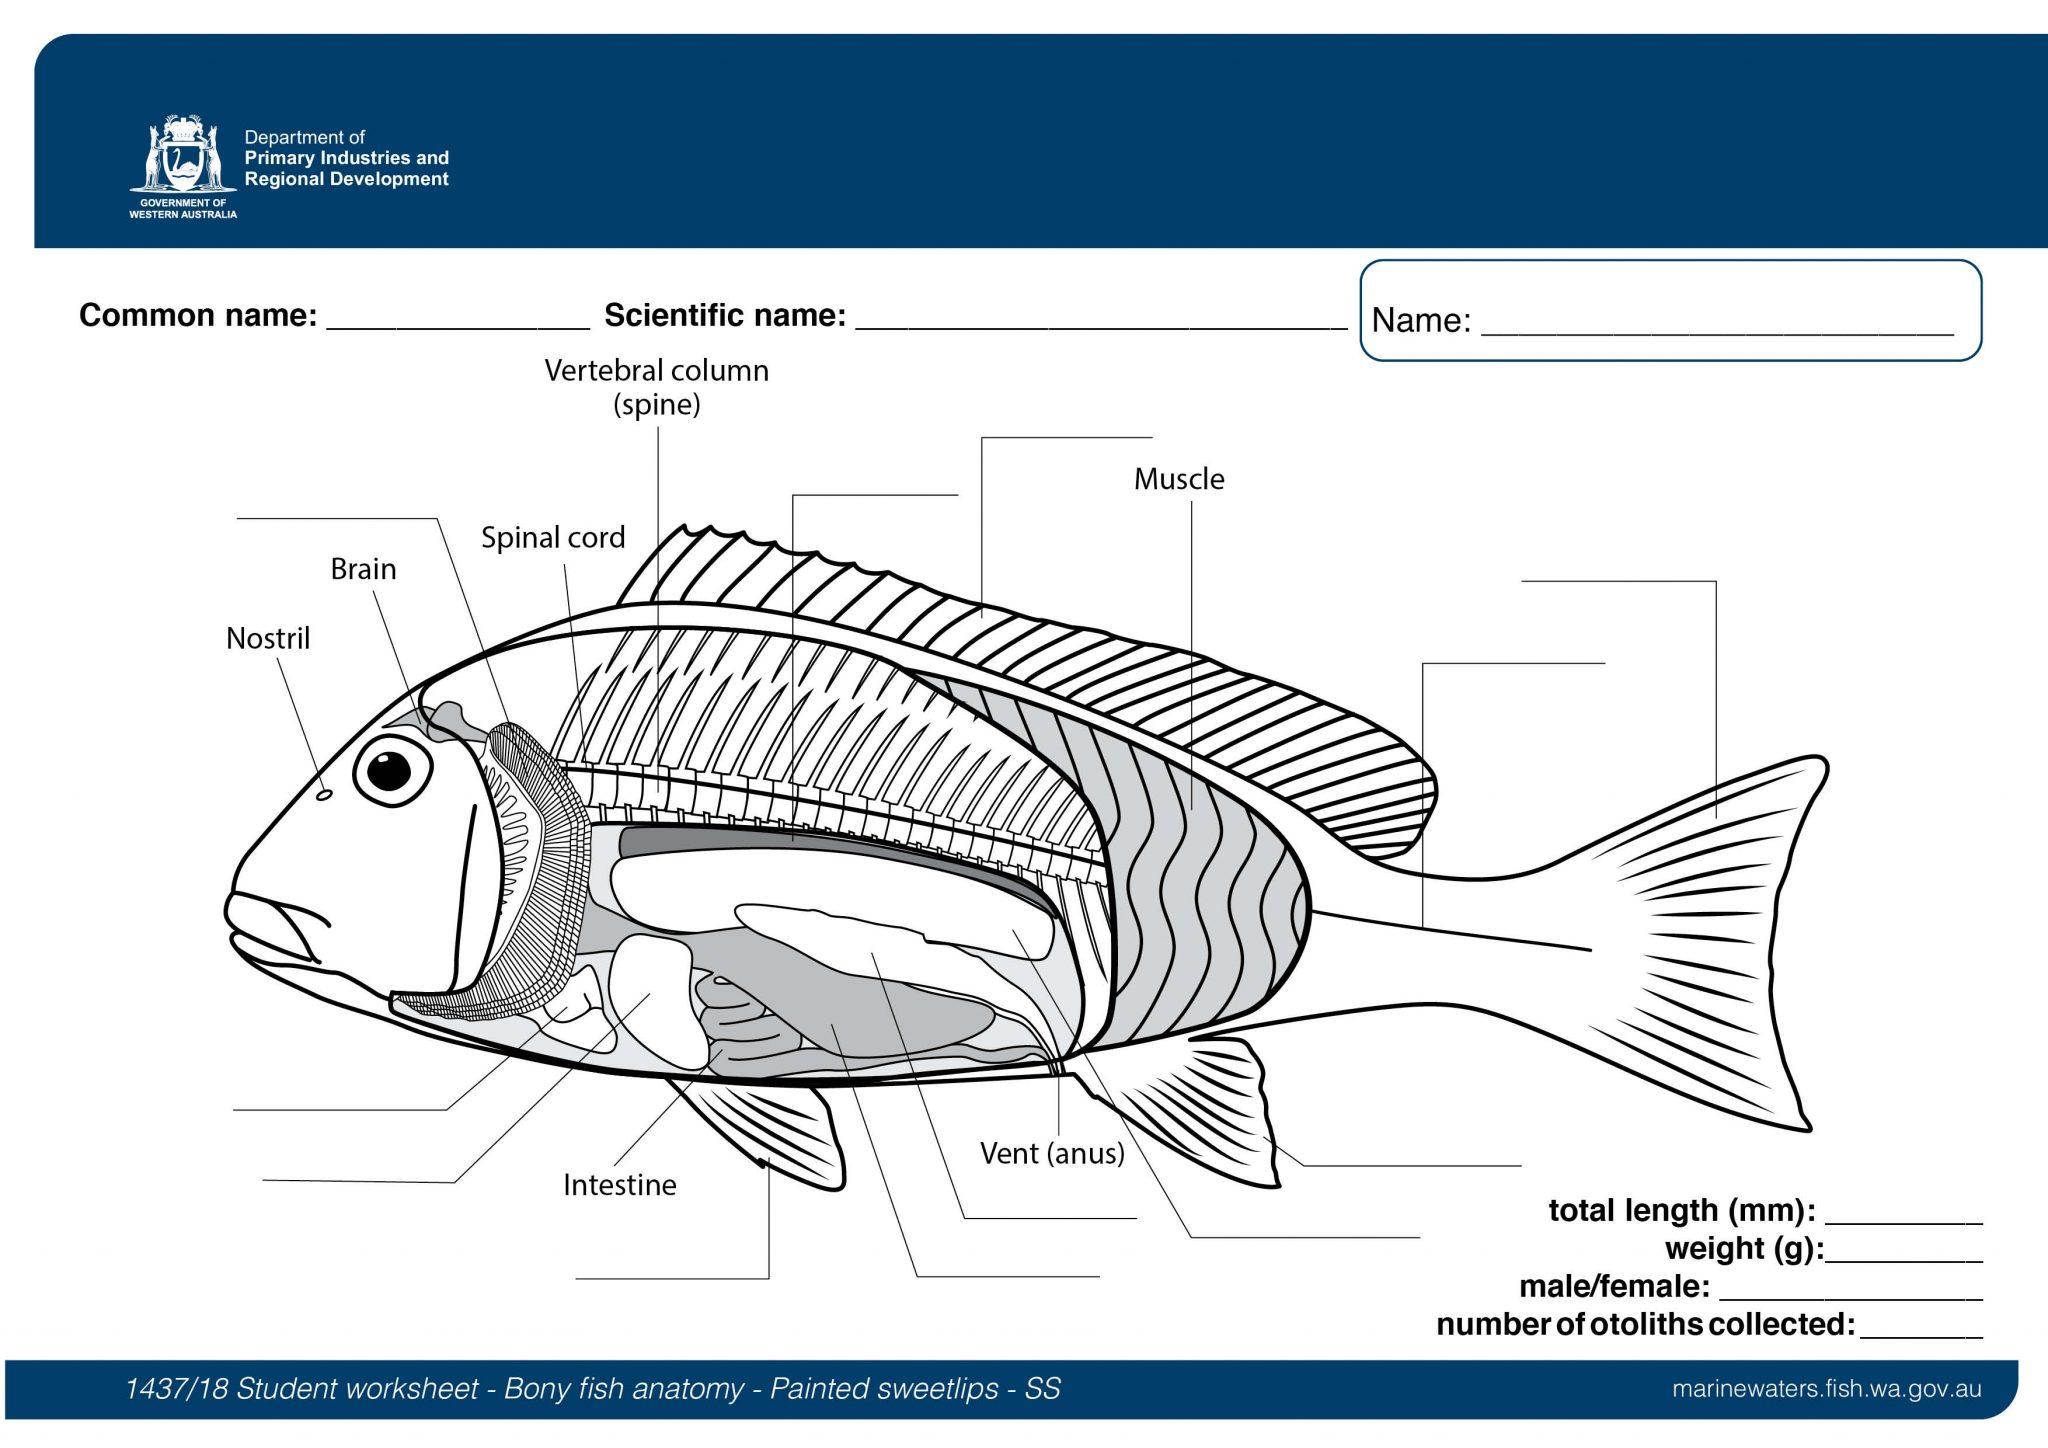 Student Worksheet Bony fish anatomy   Painted sweetlips ...